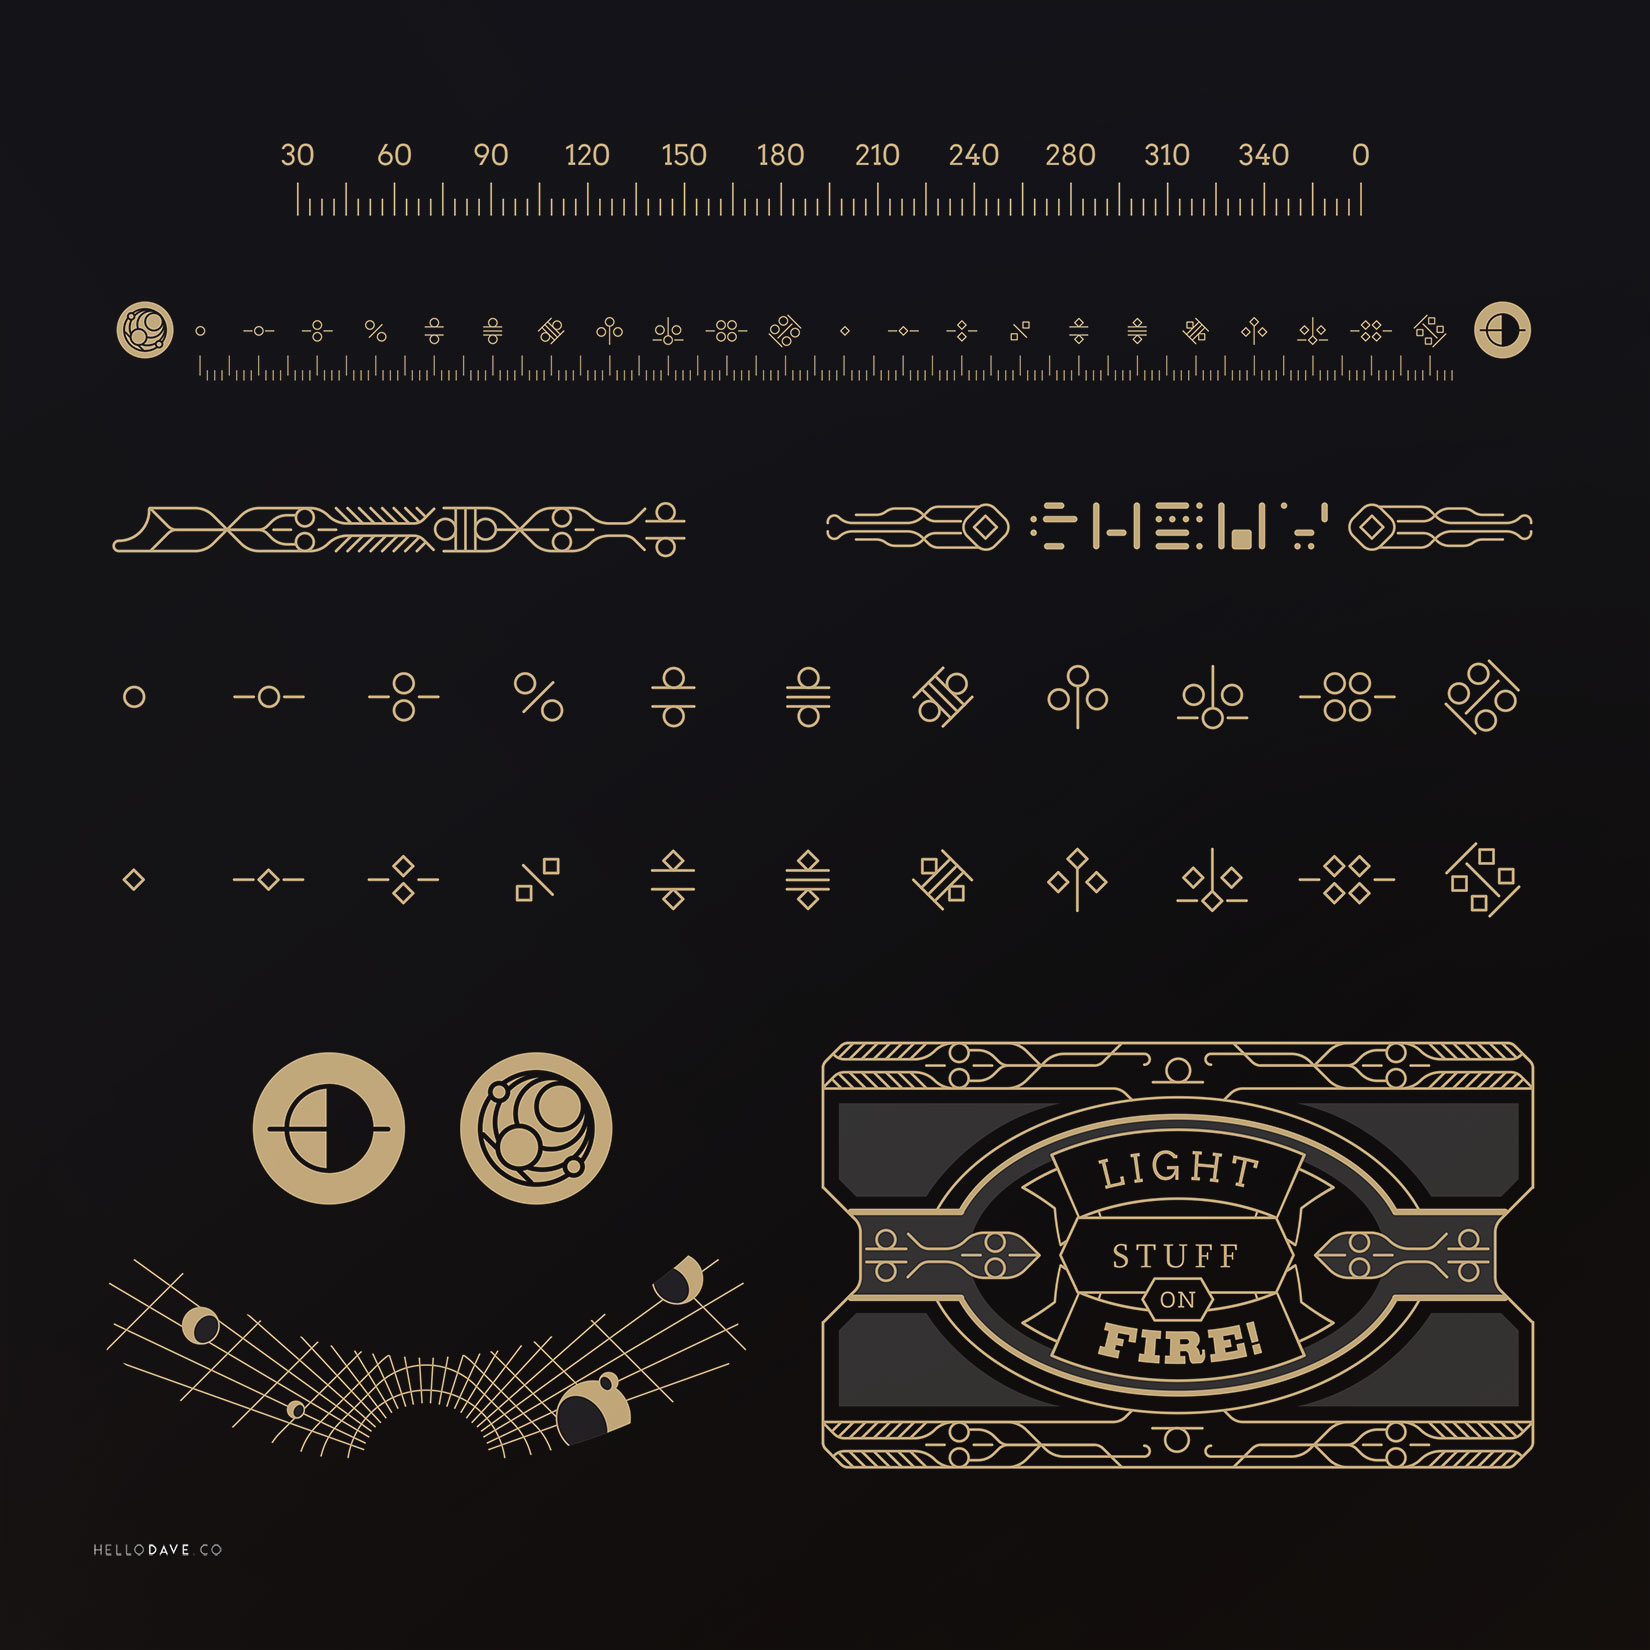 Steampunk_table_astrolabe_13_FHD